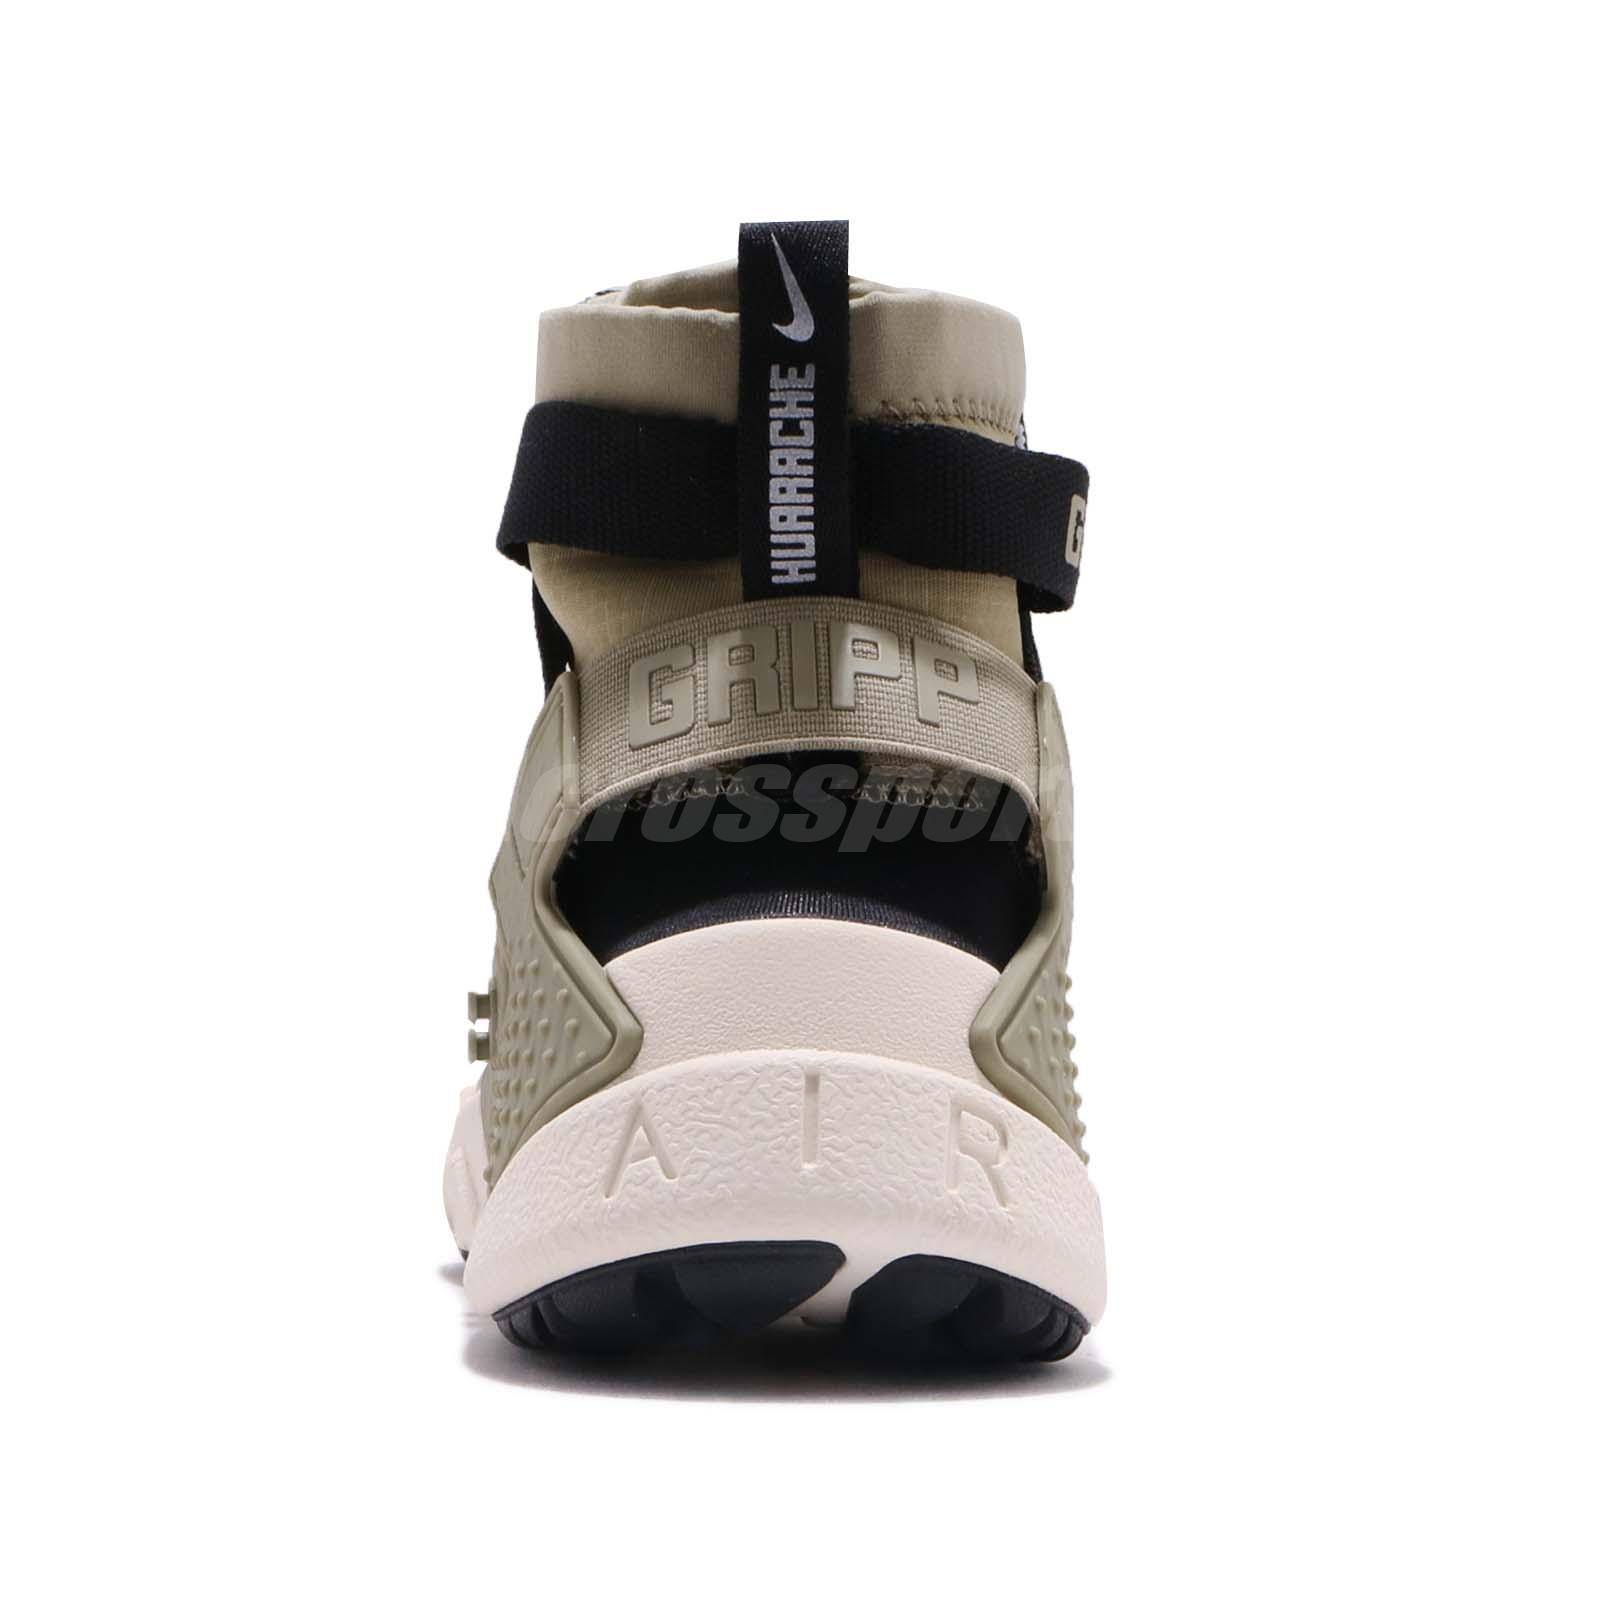 6e1e8784e194 Nike Air Huarache Gripp Neutral Olive Black Men Lifestyle Shoes ...